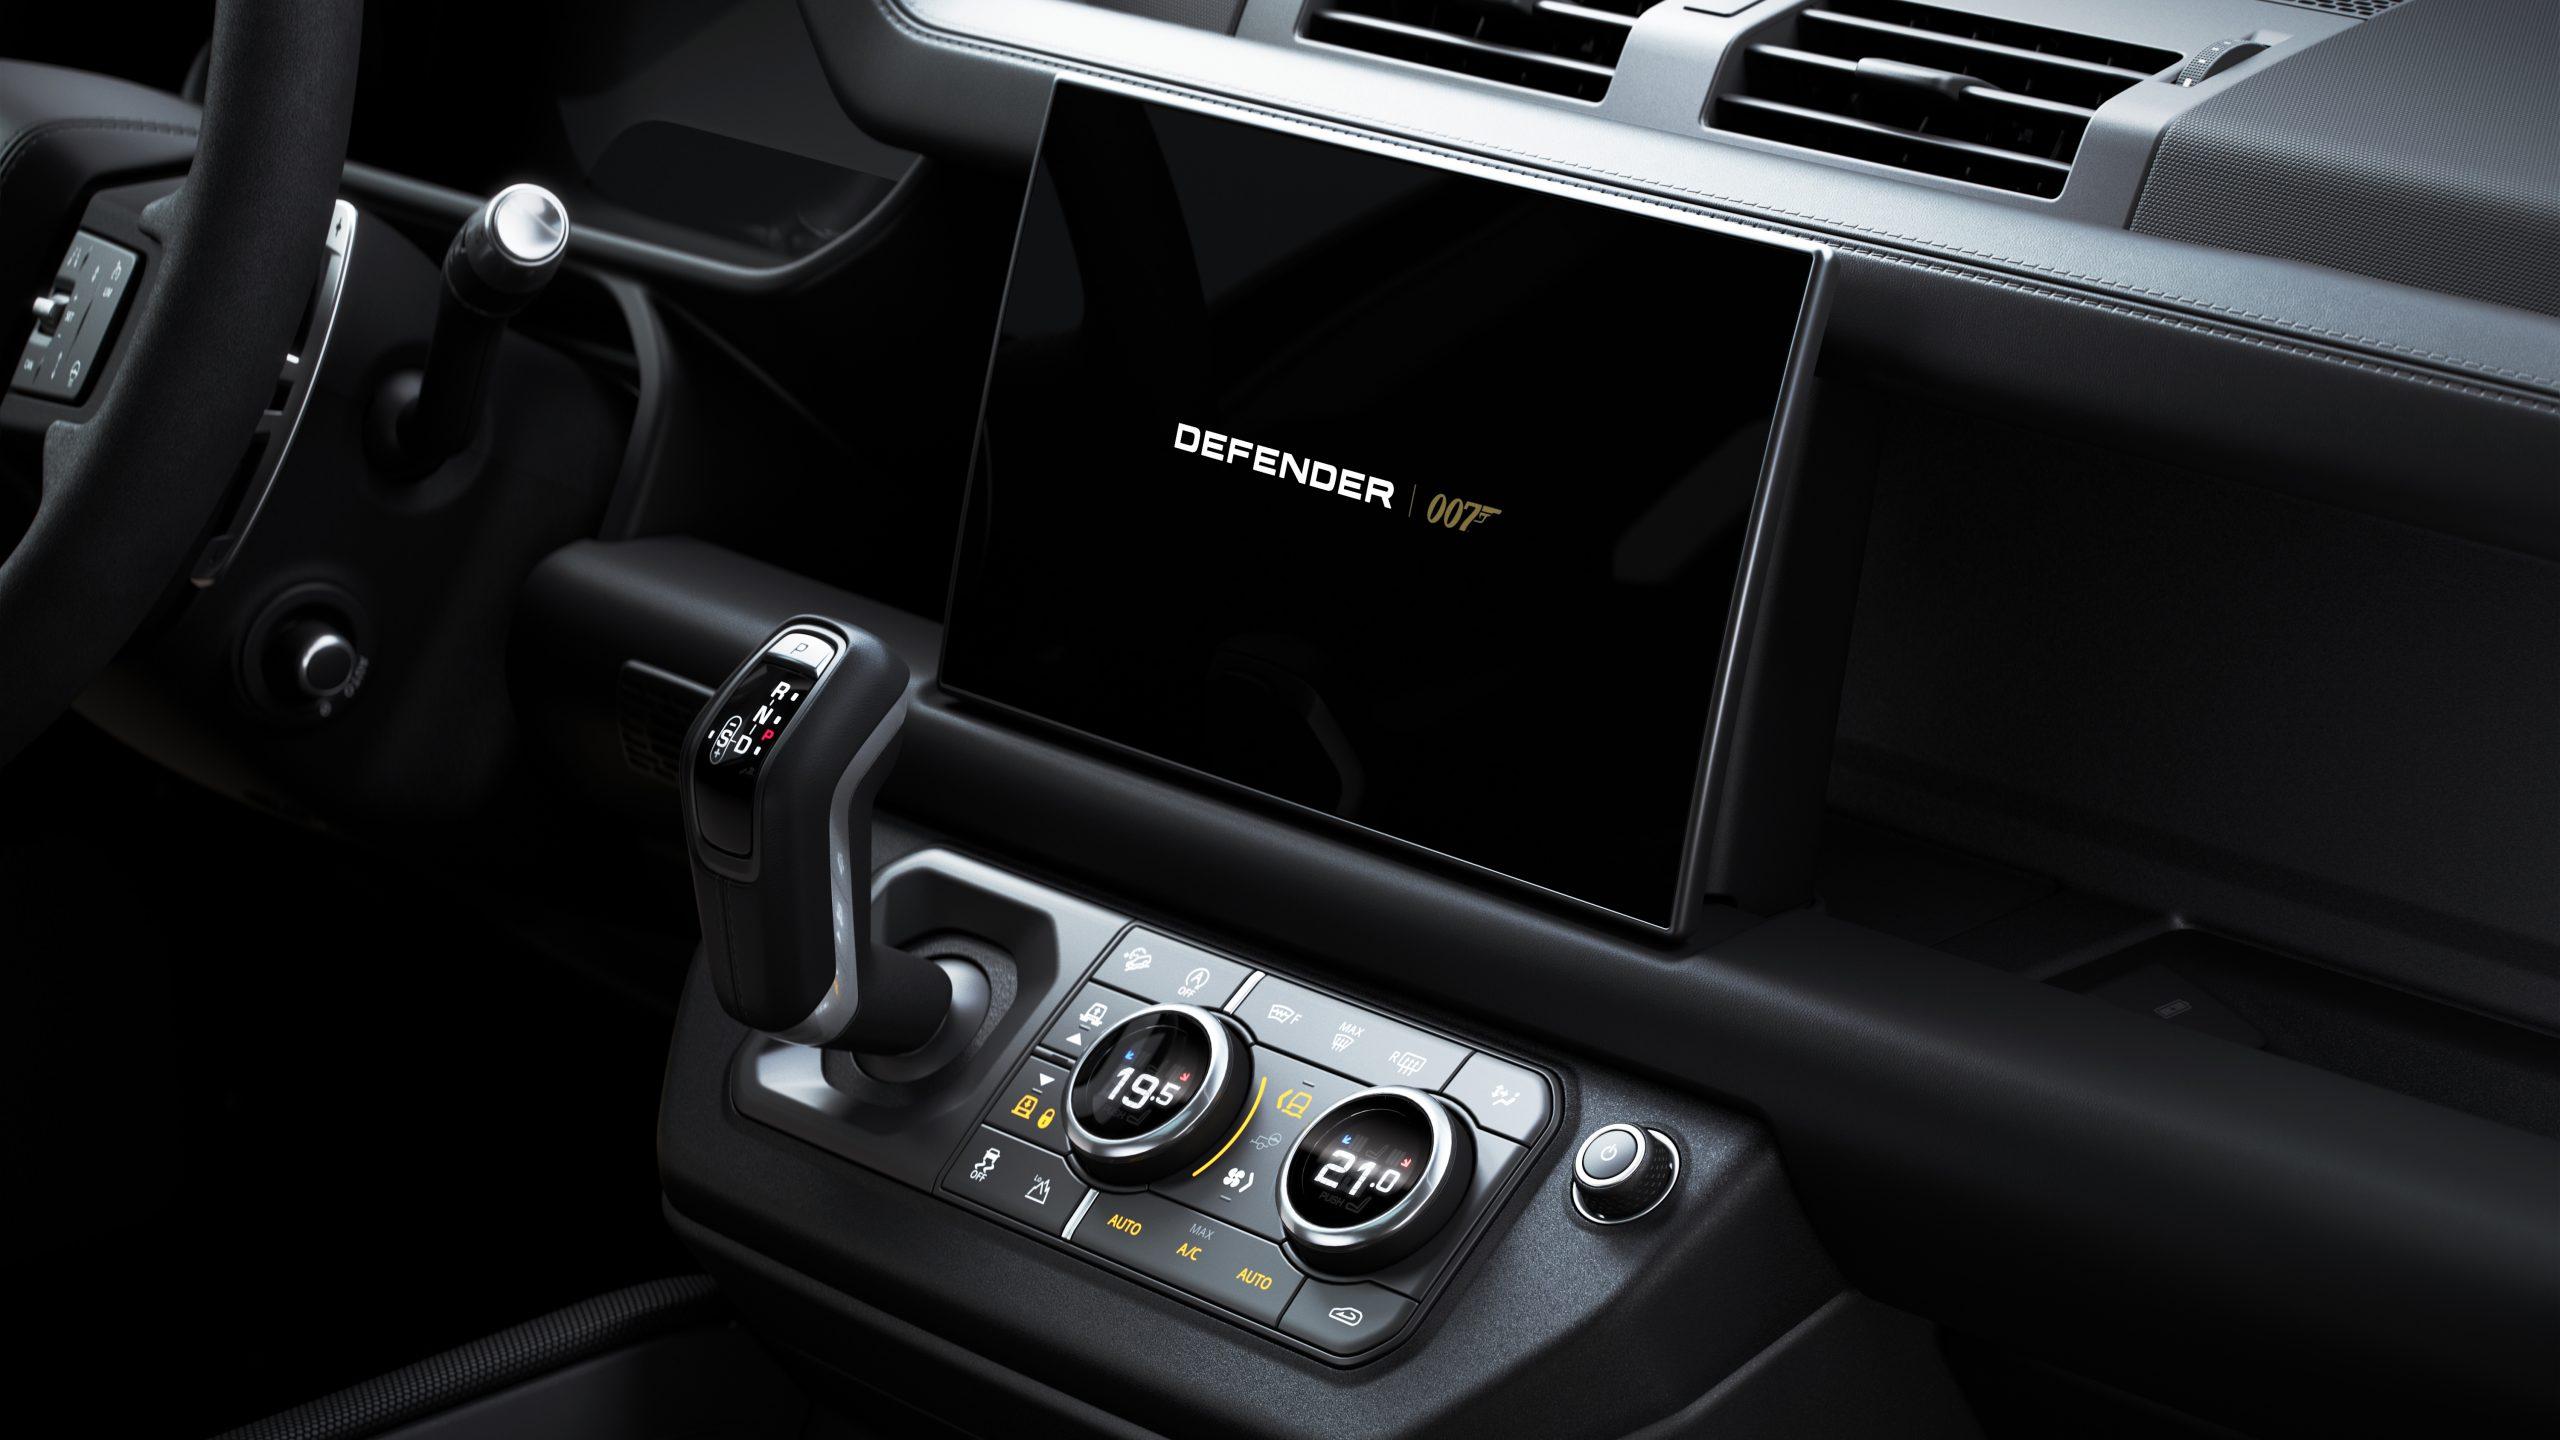 Land RoverDefender V8 Bond Edition